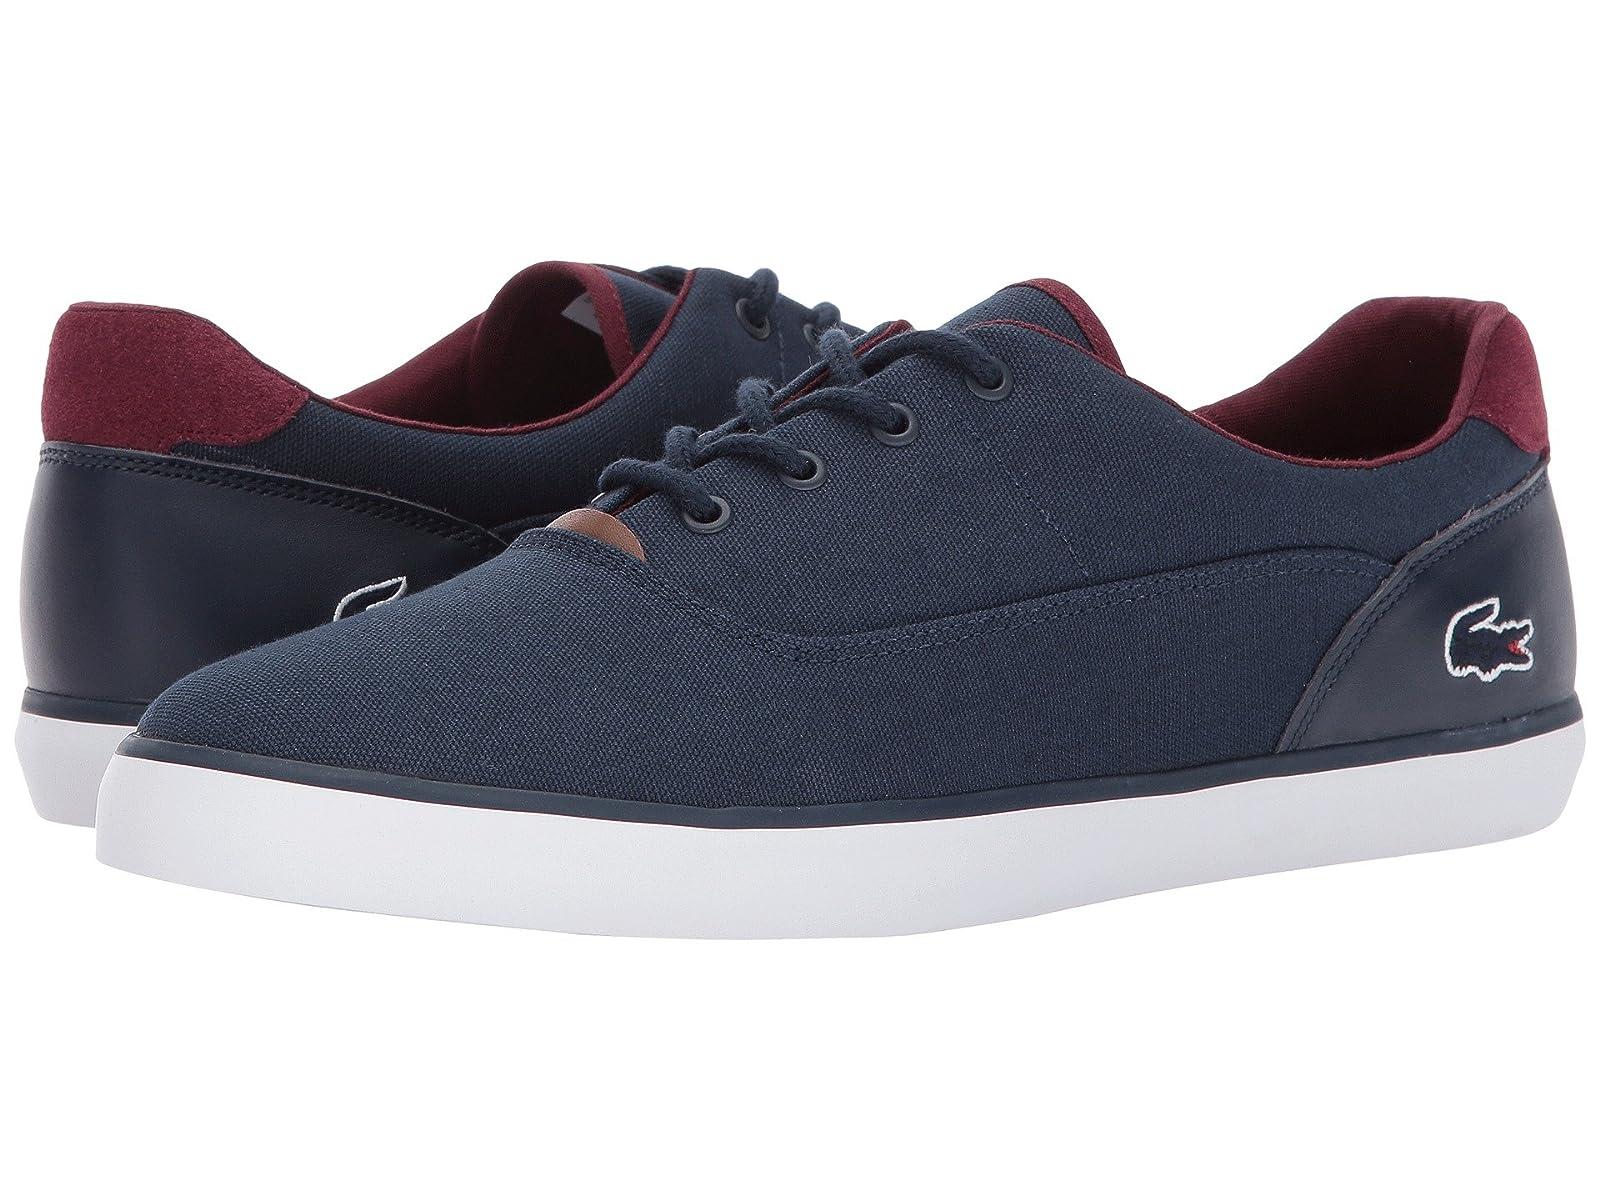 Lacoste Jouer 317 1Atmospheric grades have affordable shoes